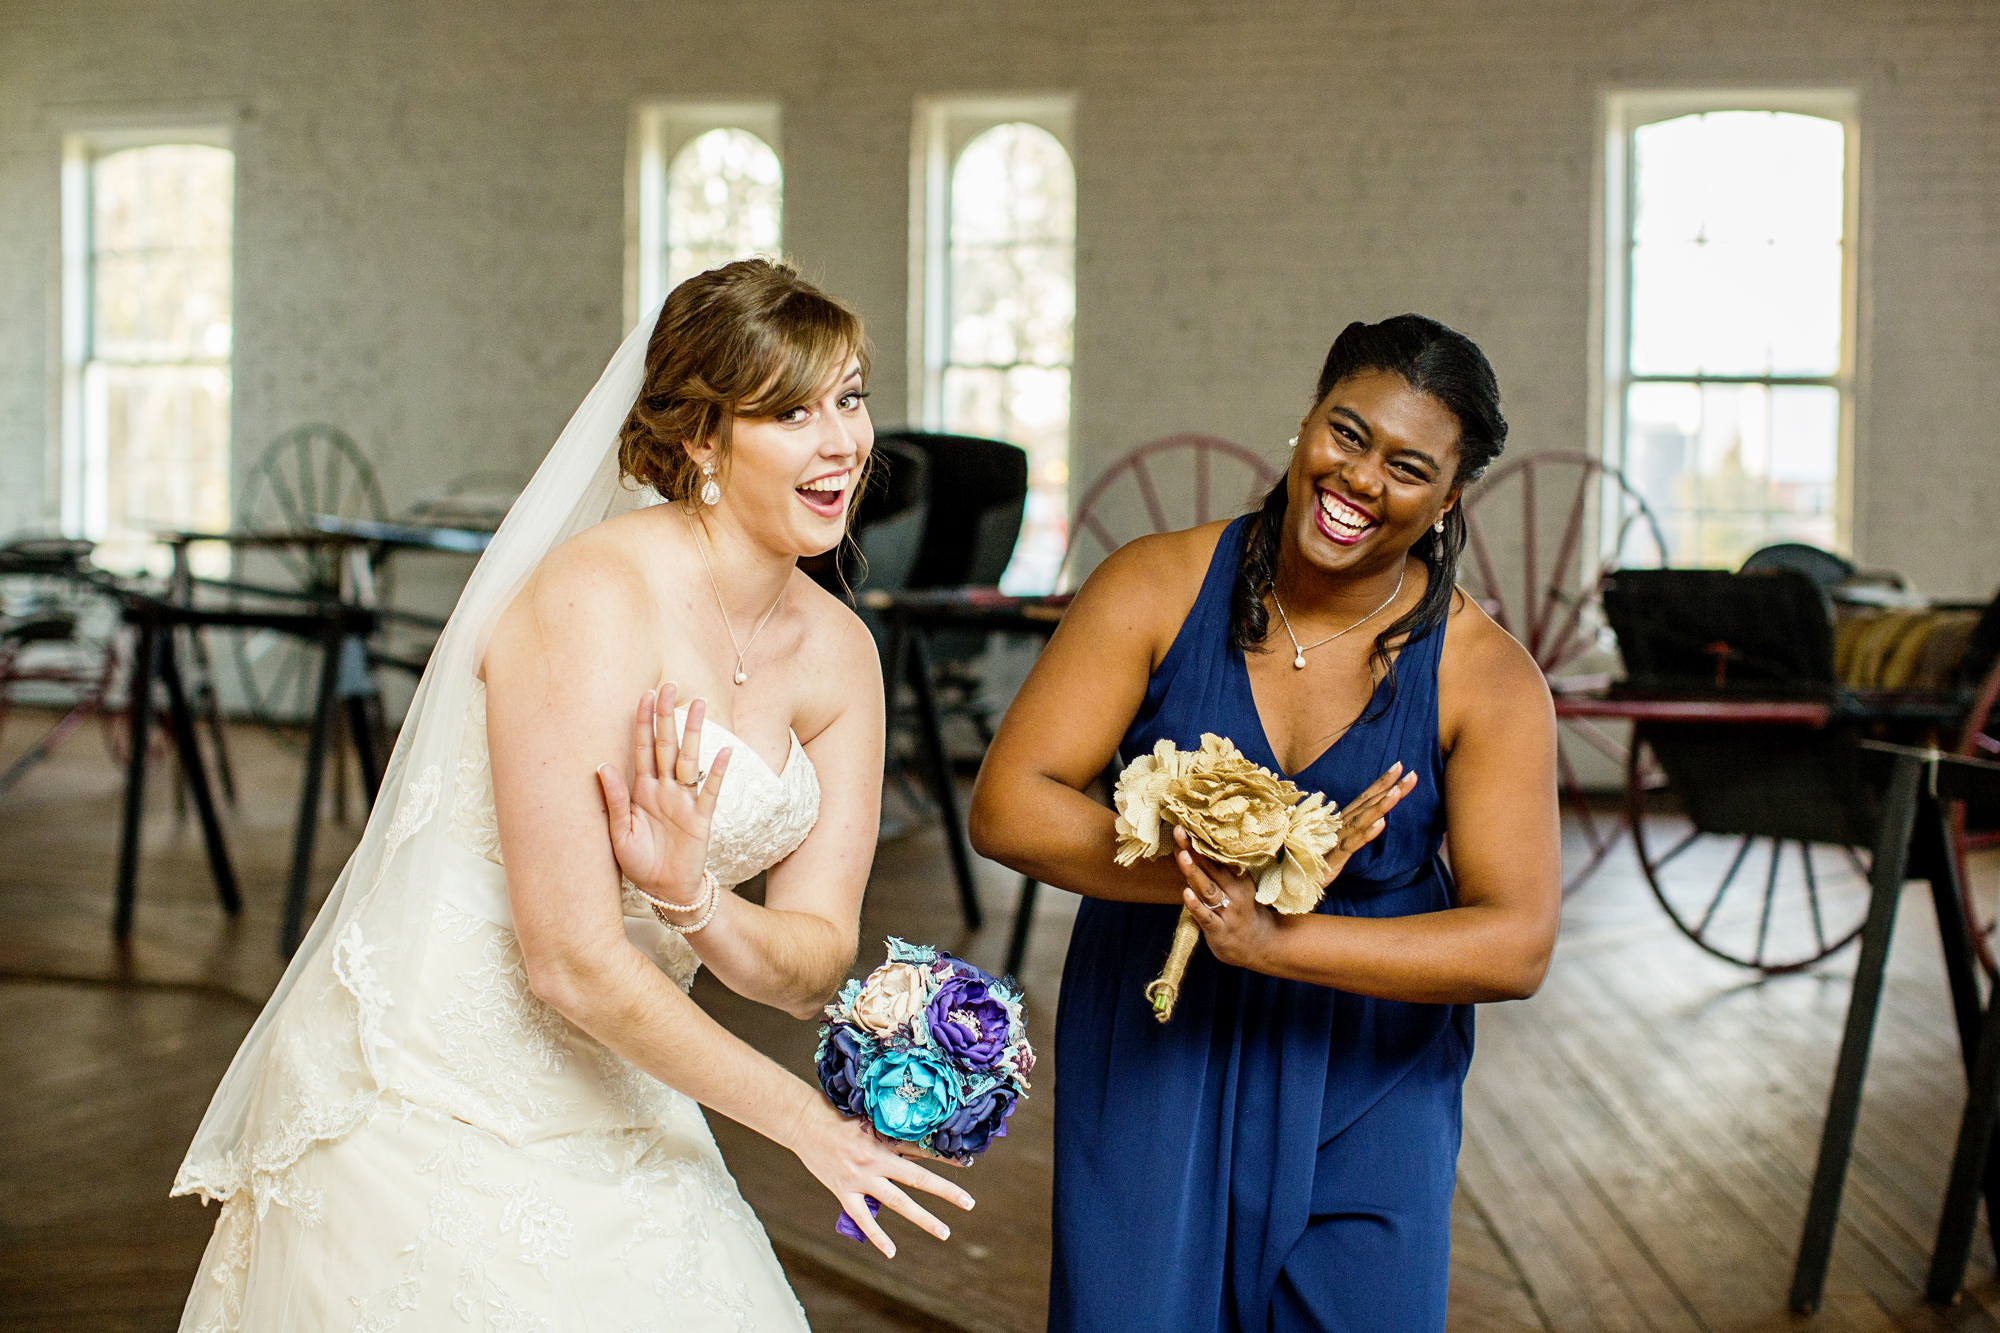 Seriously_Sabrina_Photography_Lexington_Kentucky_21c_Round_Barn_Red_Mile_Wedding_Gorley_73.jpg